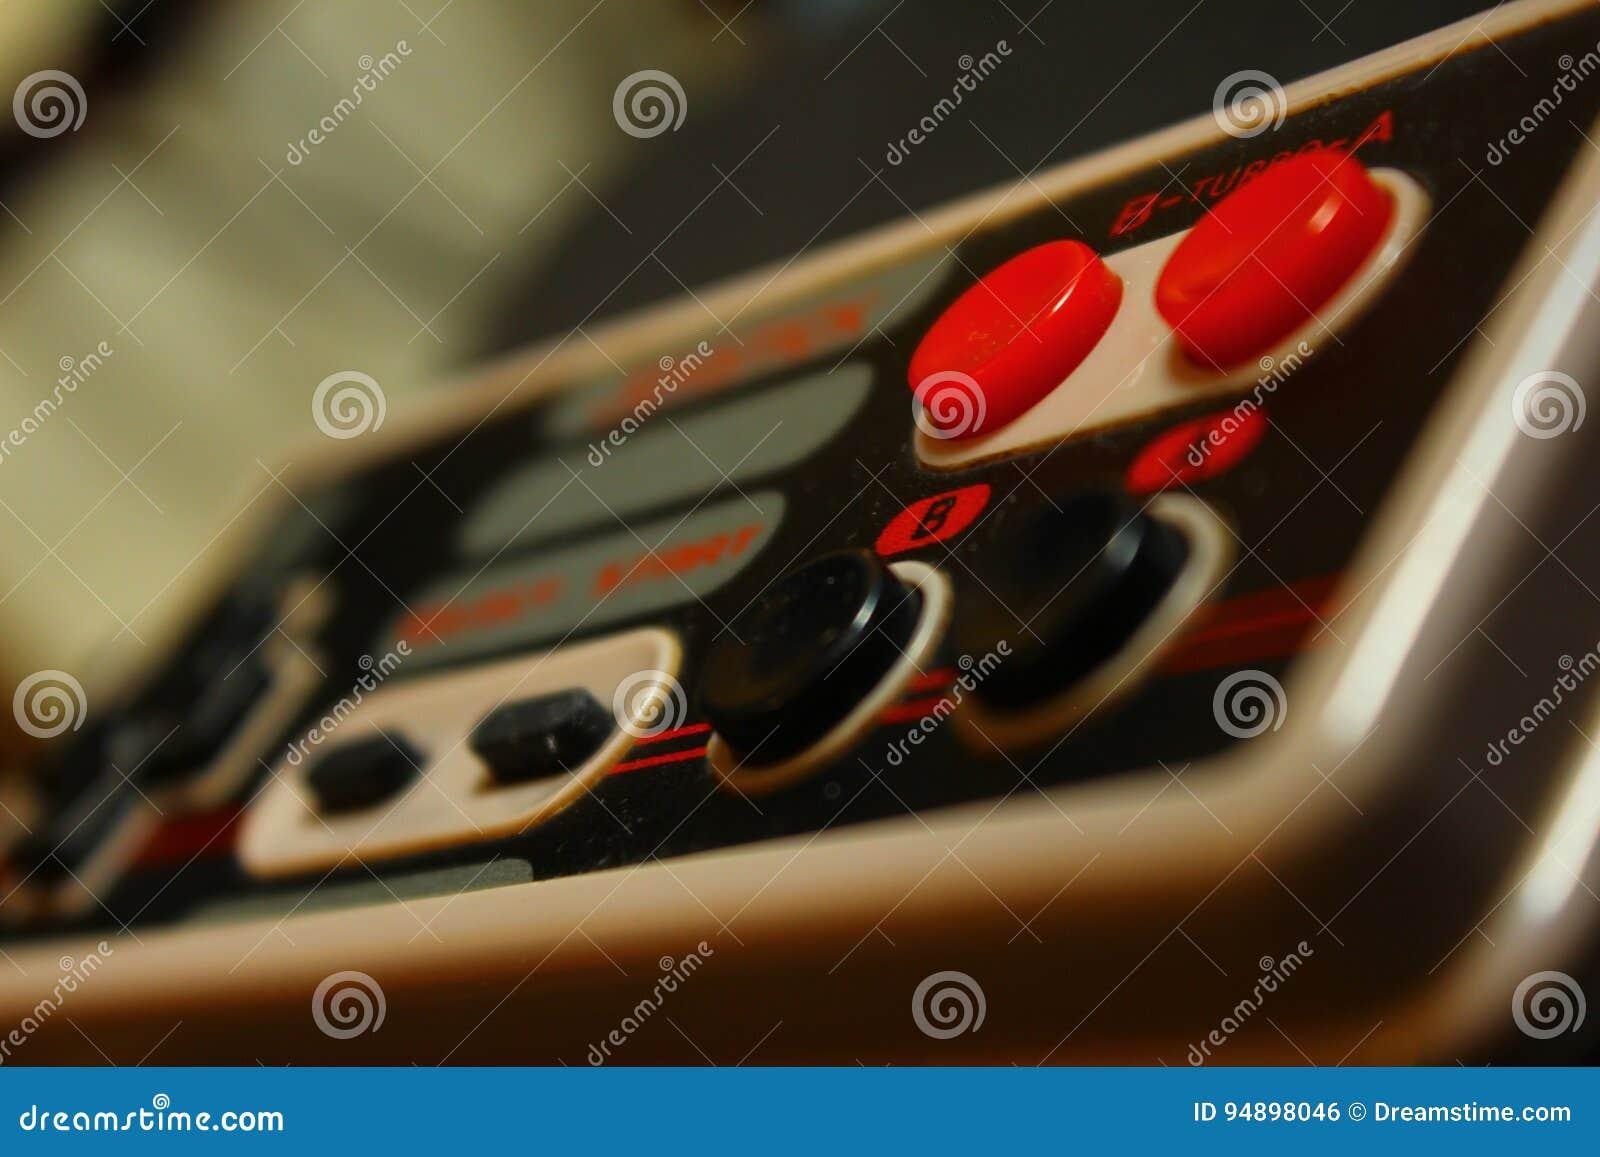 8 bit video game joystick 4 nintendo